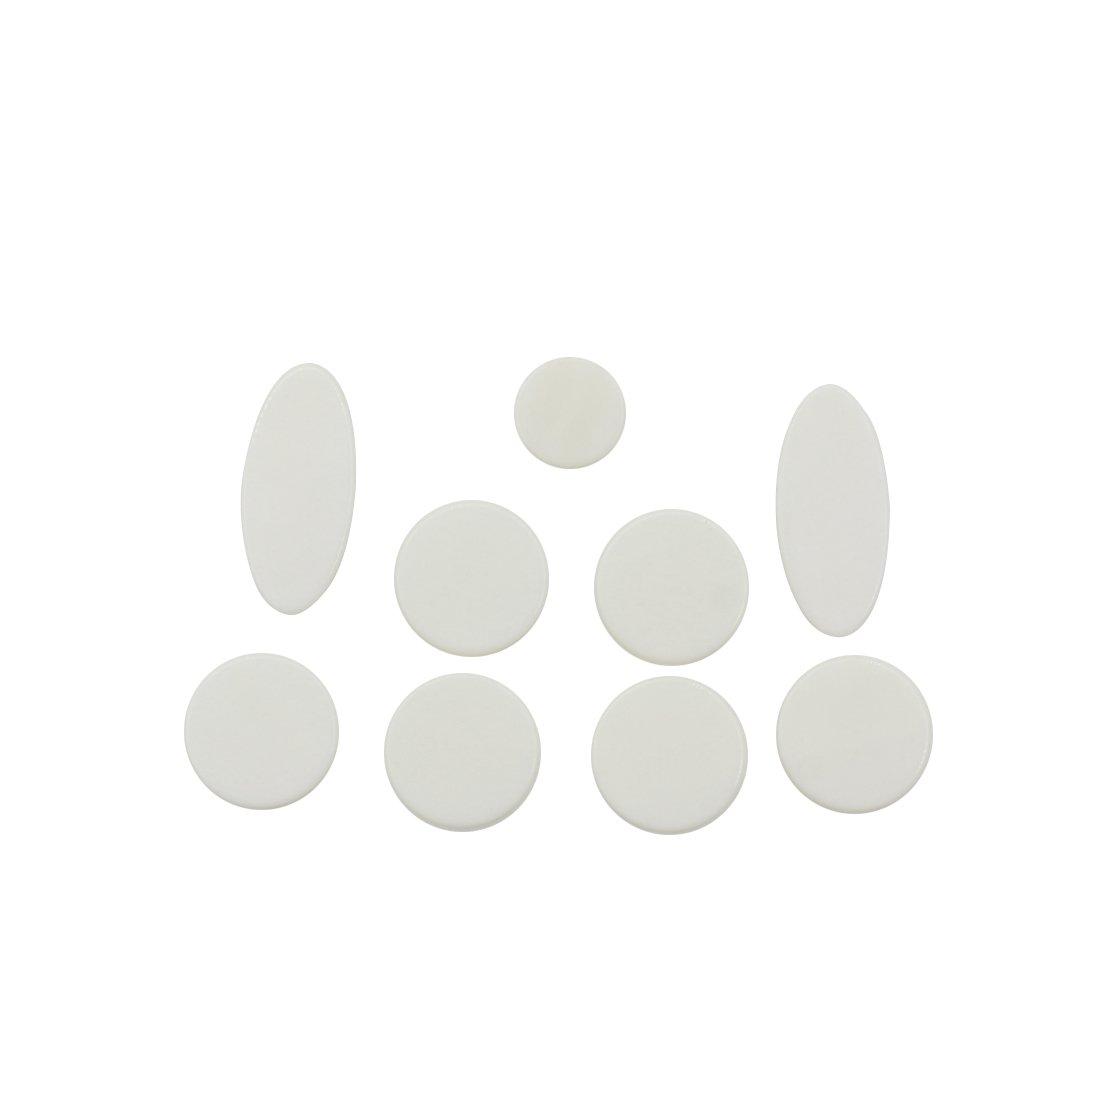 9pcs White Mother of Pearl Shell Key Button Inlays for Tenor/ Alto/ Soprano Sax Saxophone